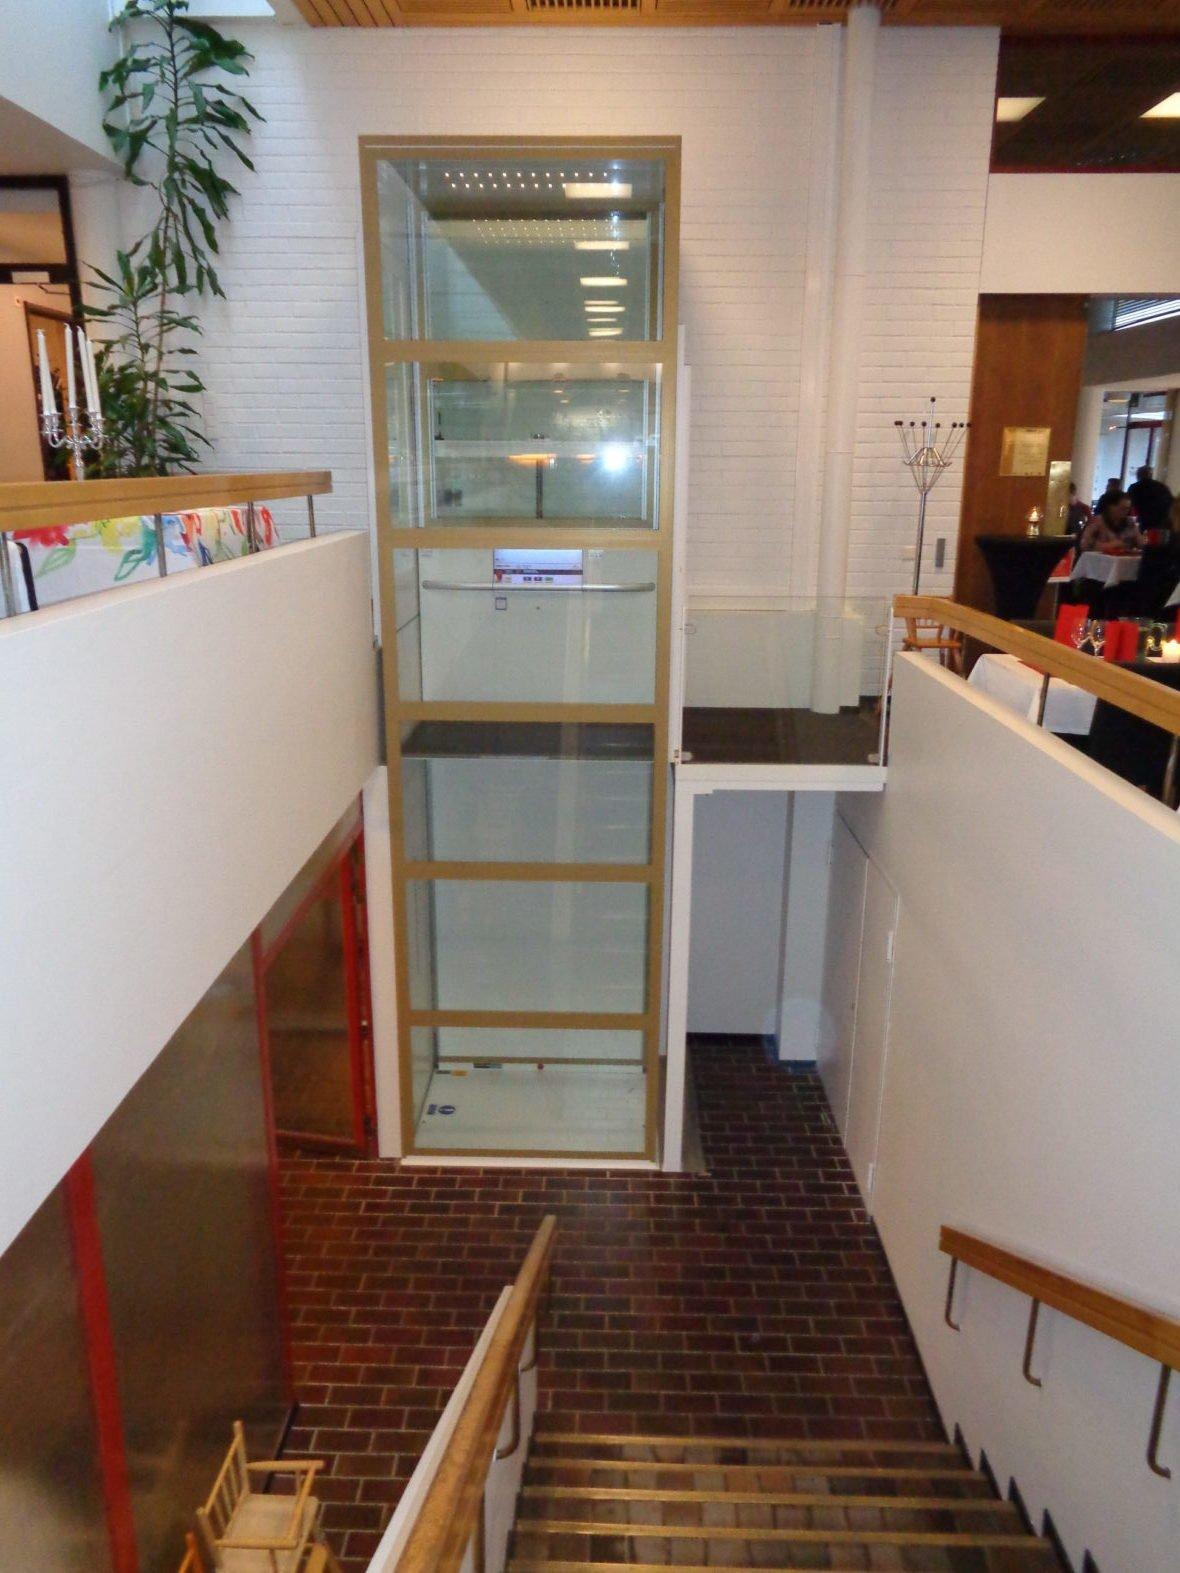 Restaurant lift